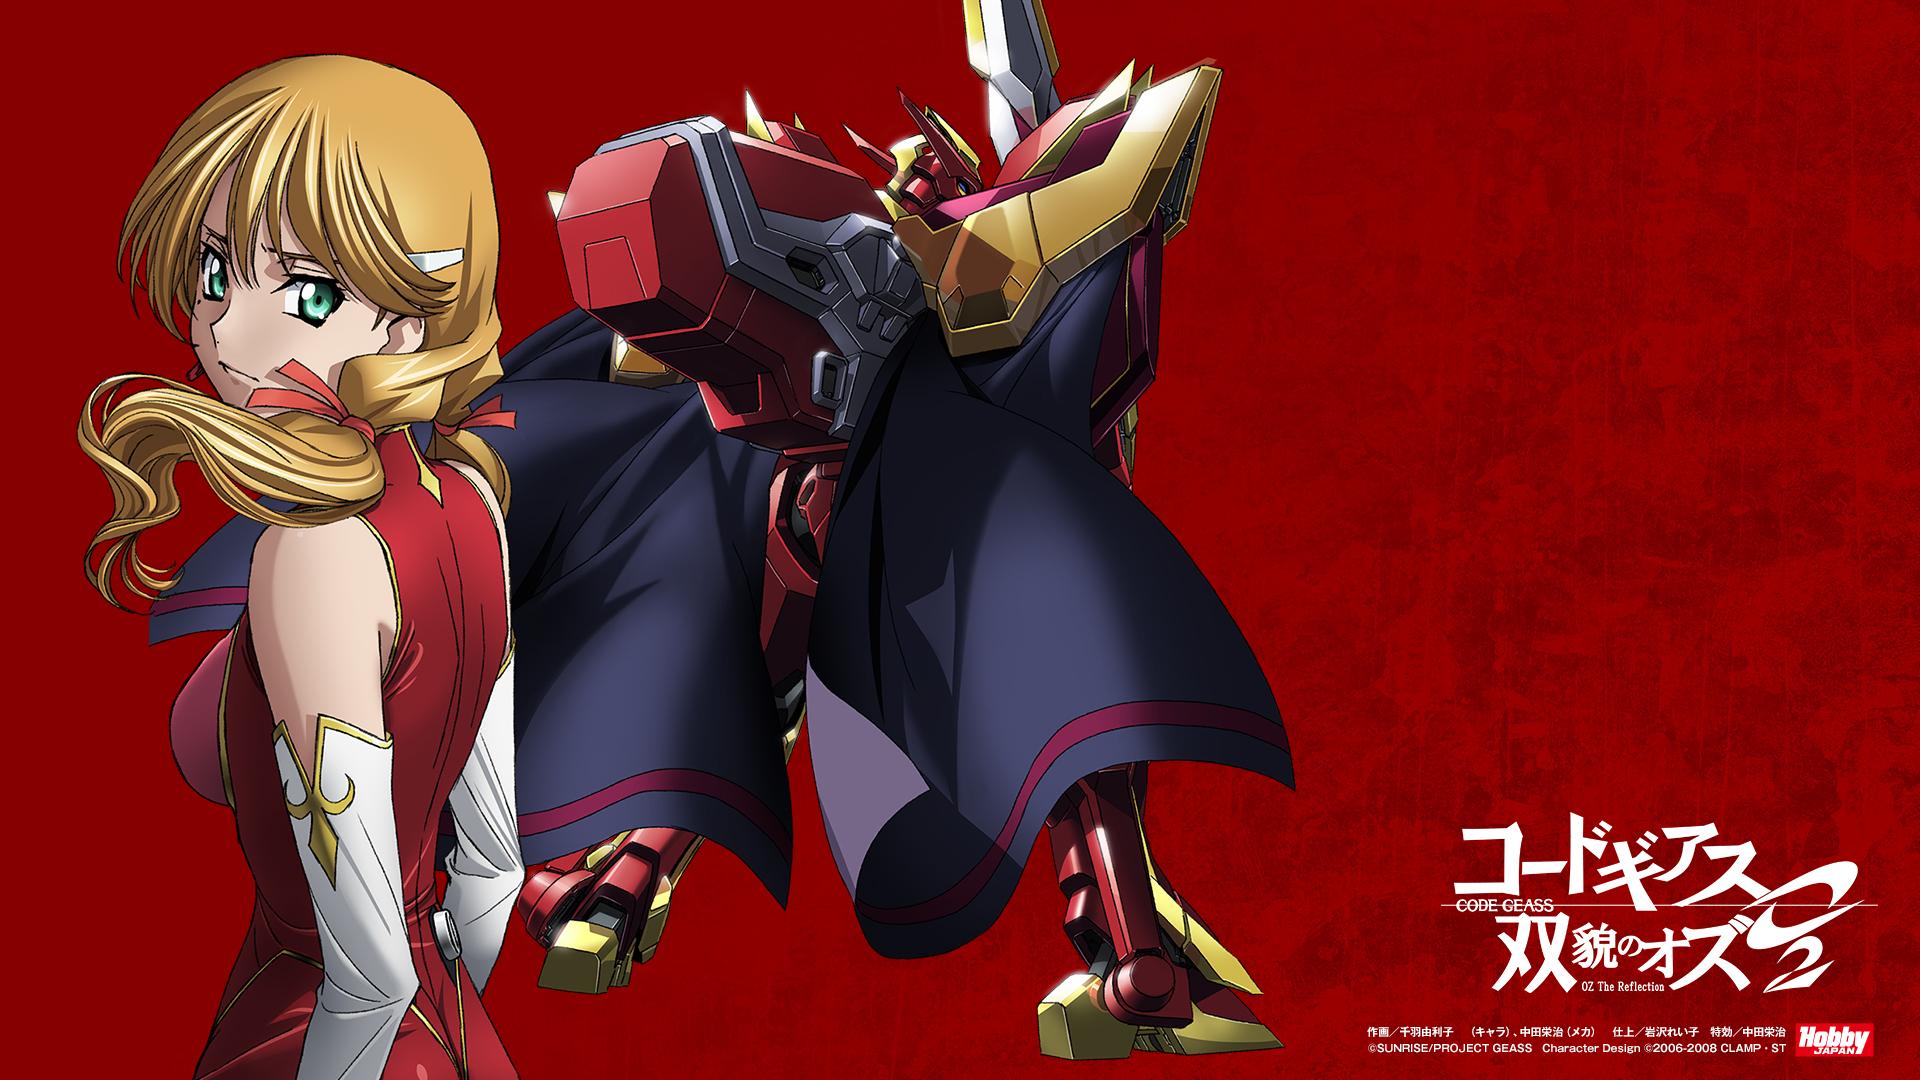 Tags Anime Toujou Chika Code Geass Soubou No Oz Knightmare